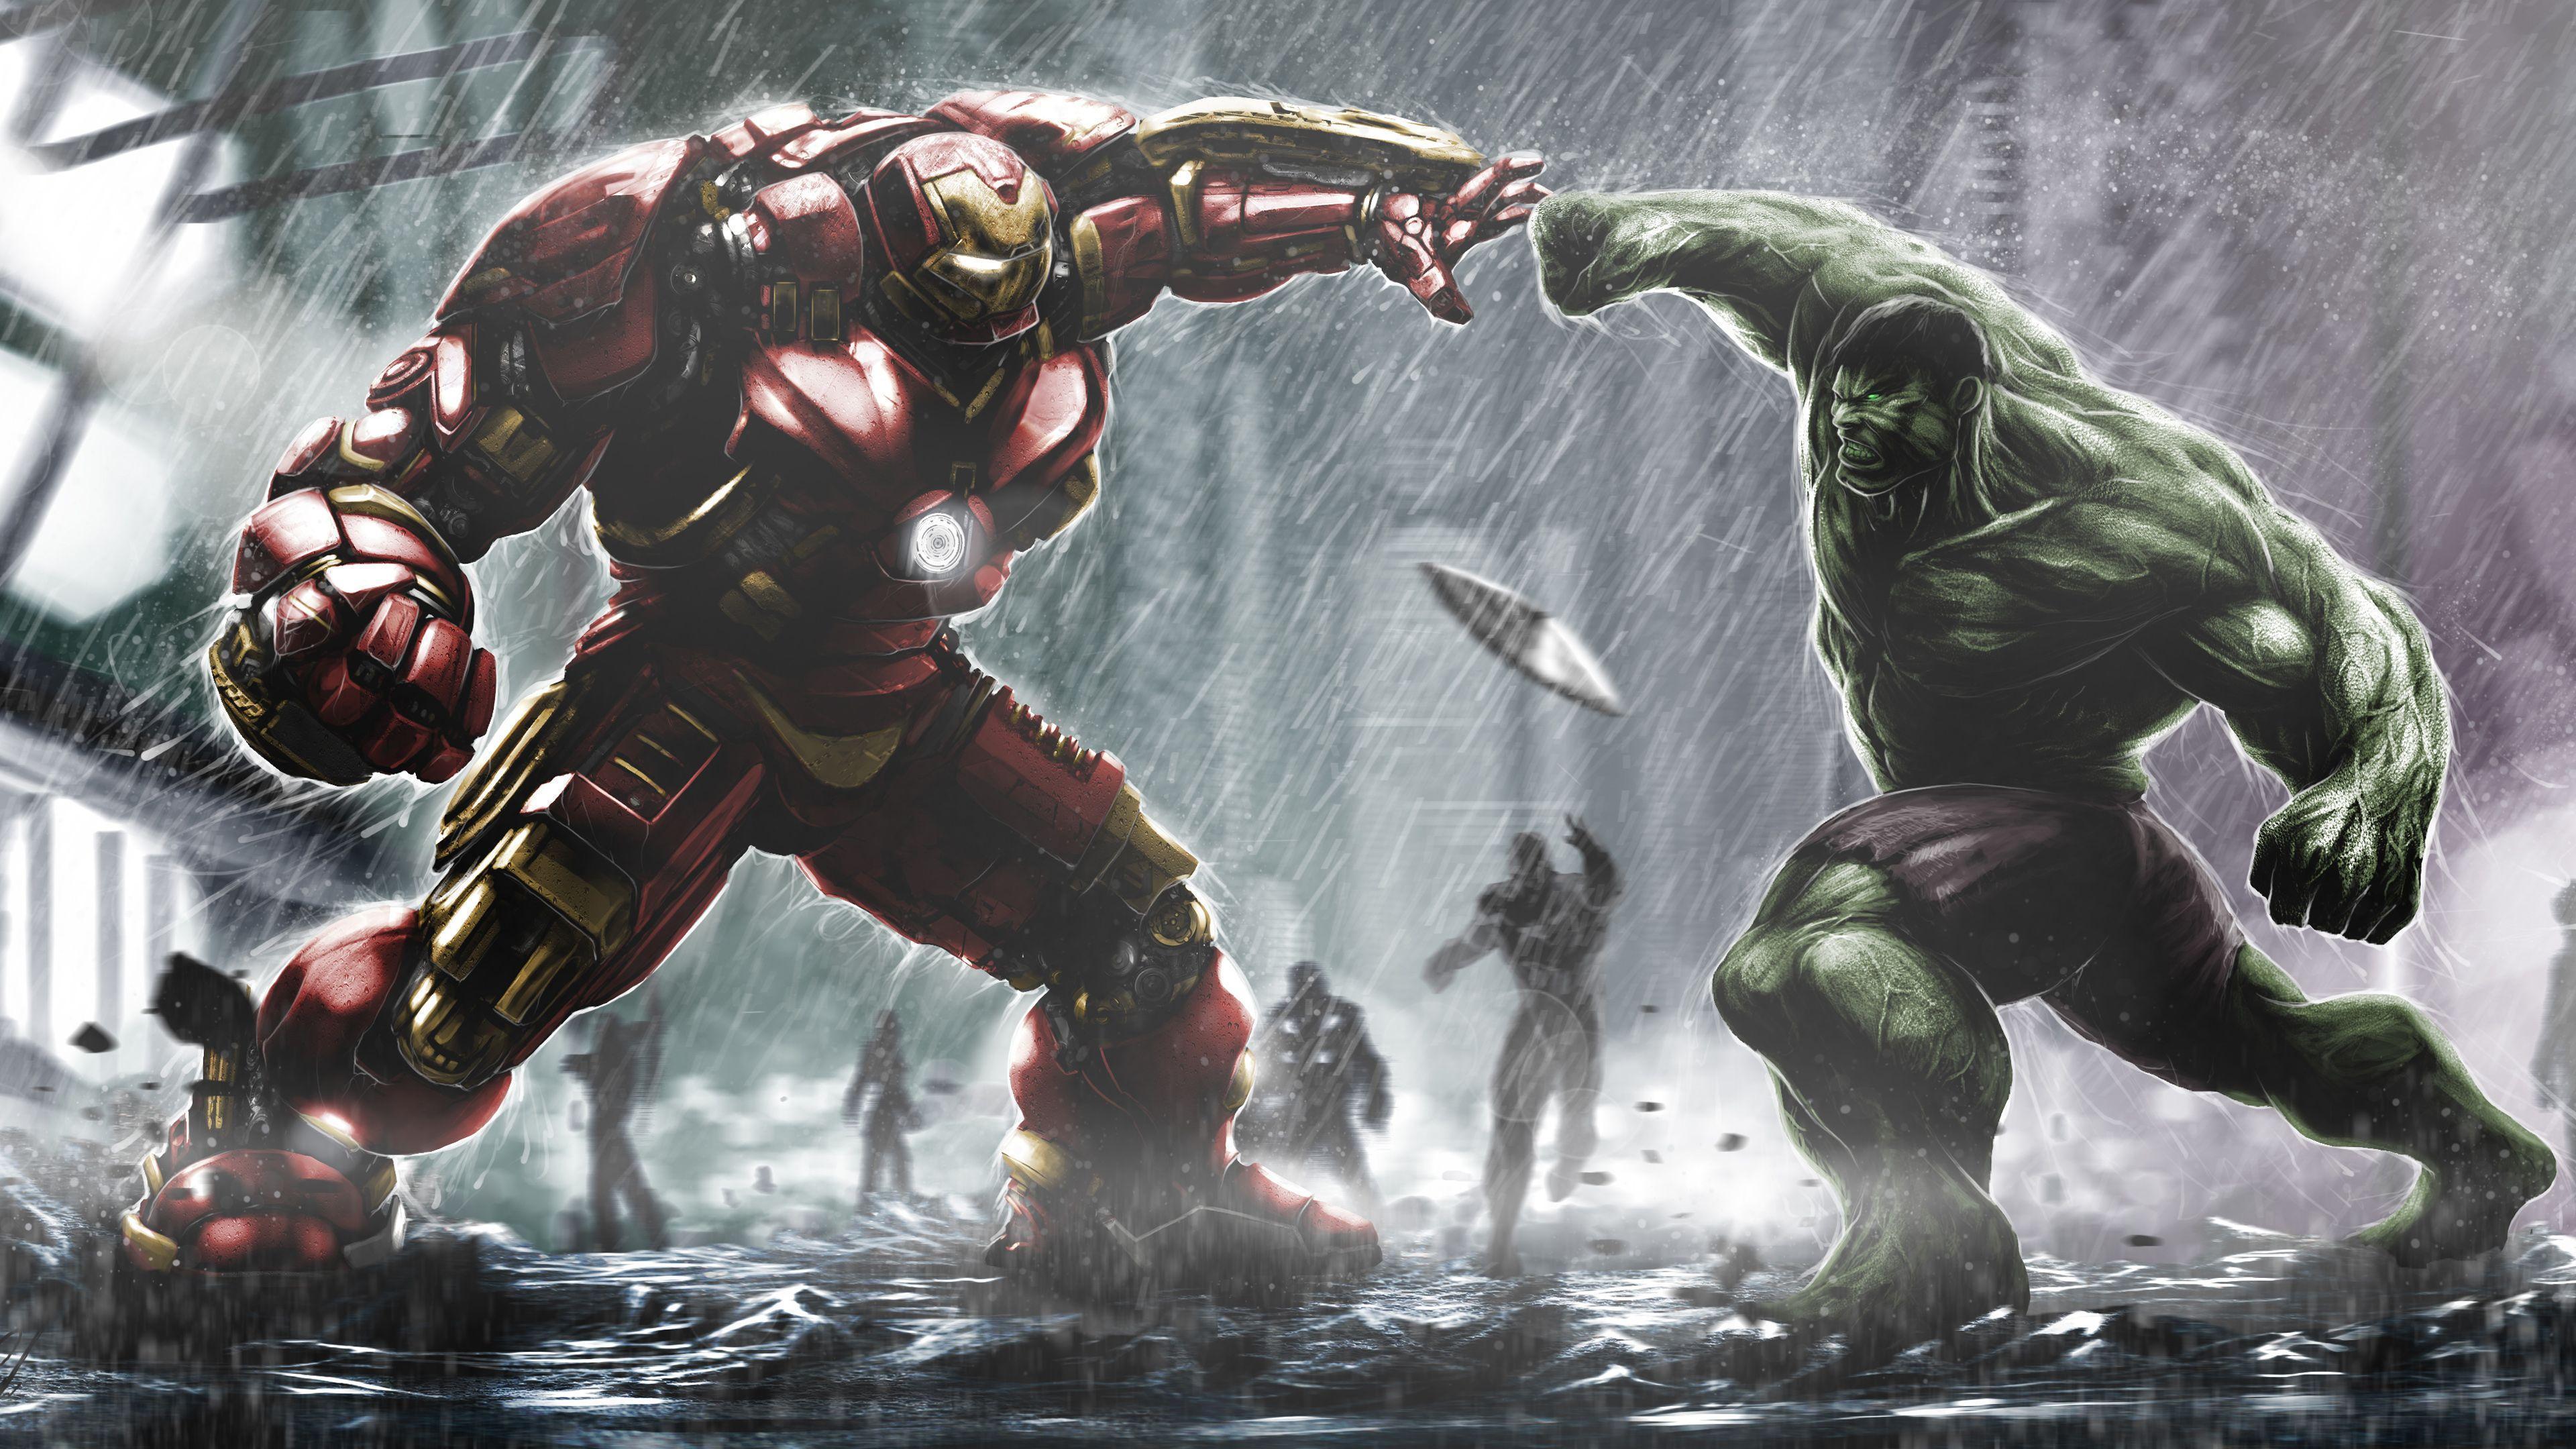 Hulk Vs Hulkbuster Wallpapers